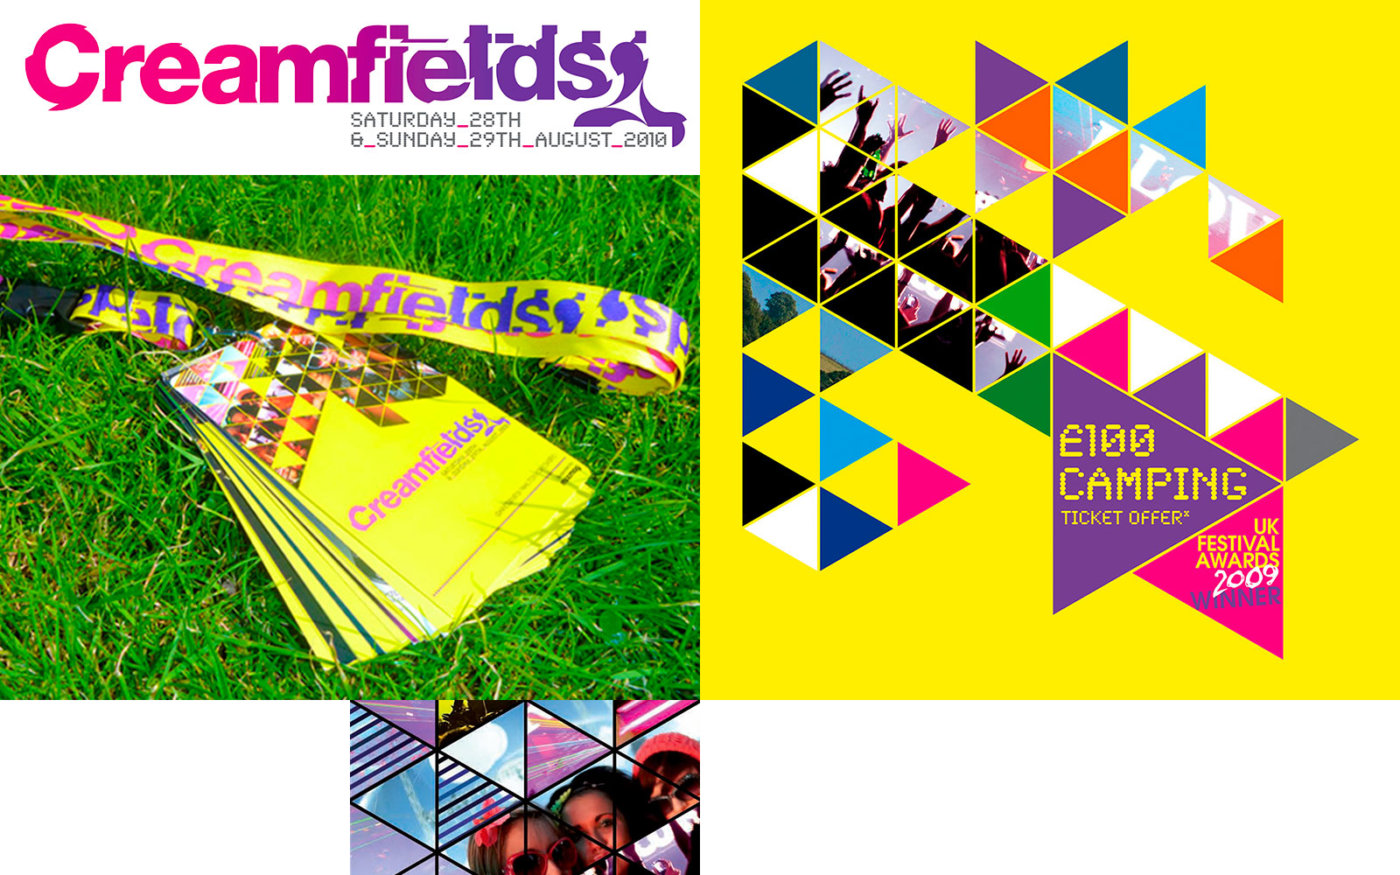 2010 campaign branding